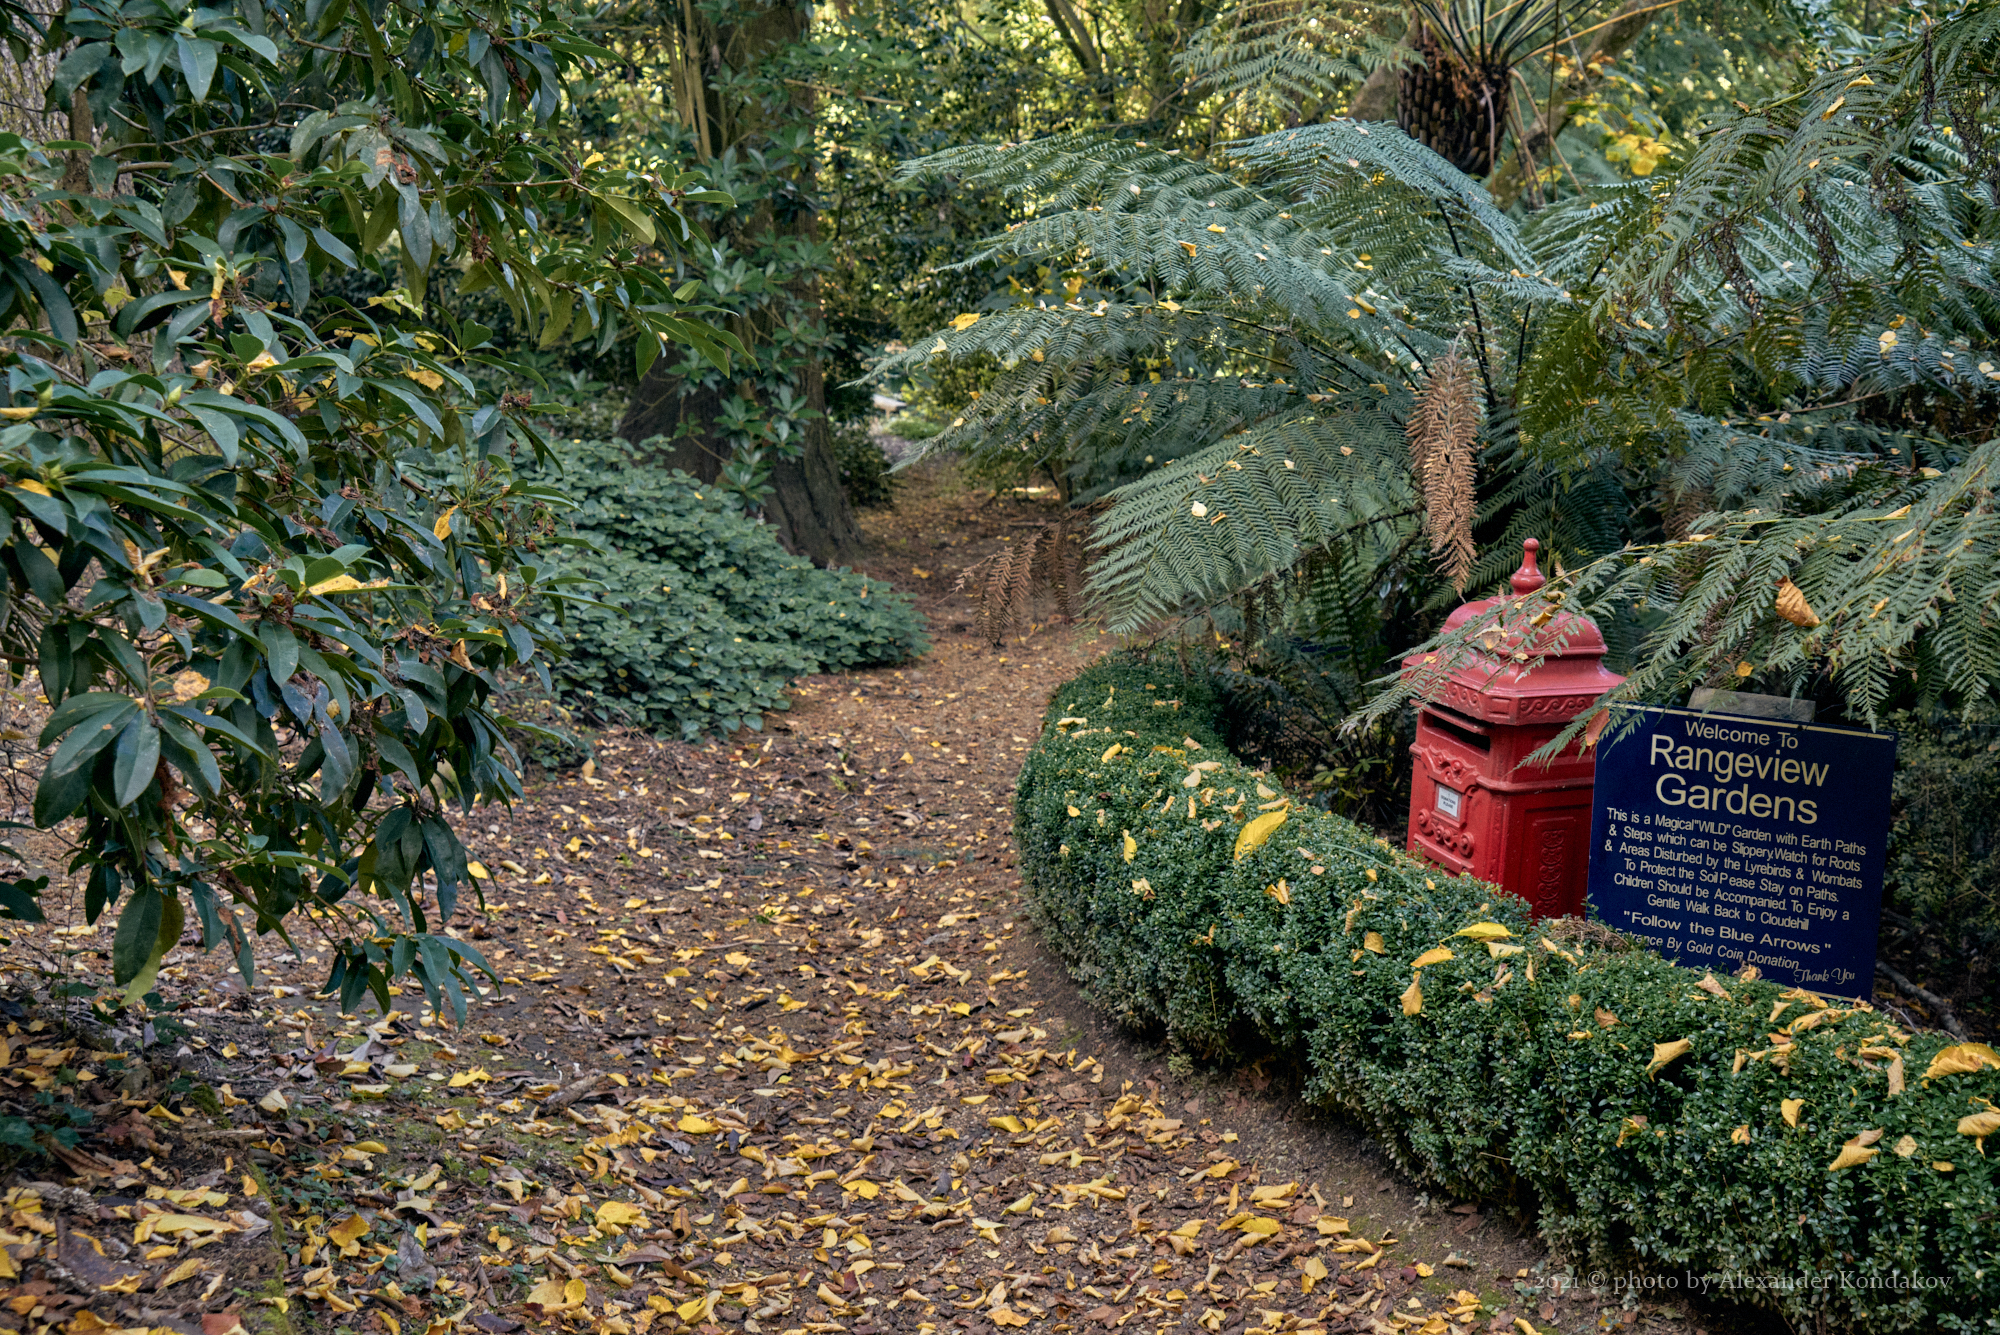 Cloudehill Garden & Nursery